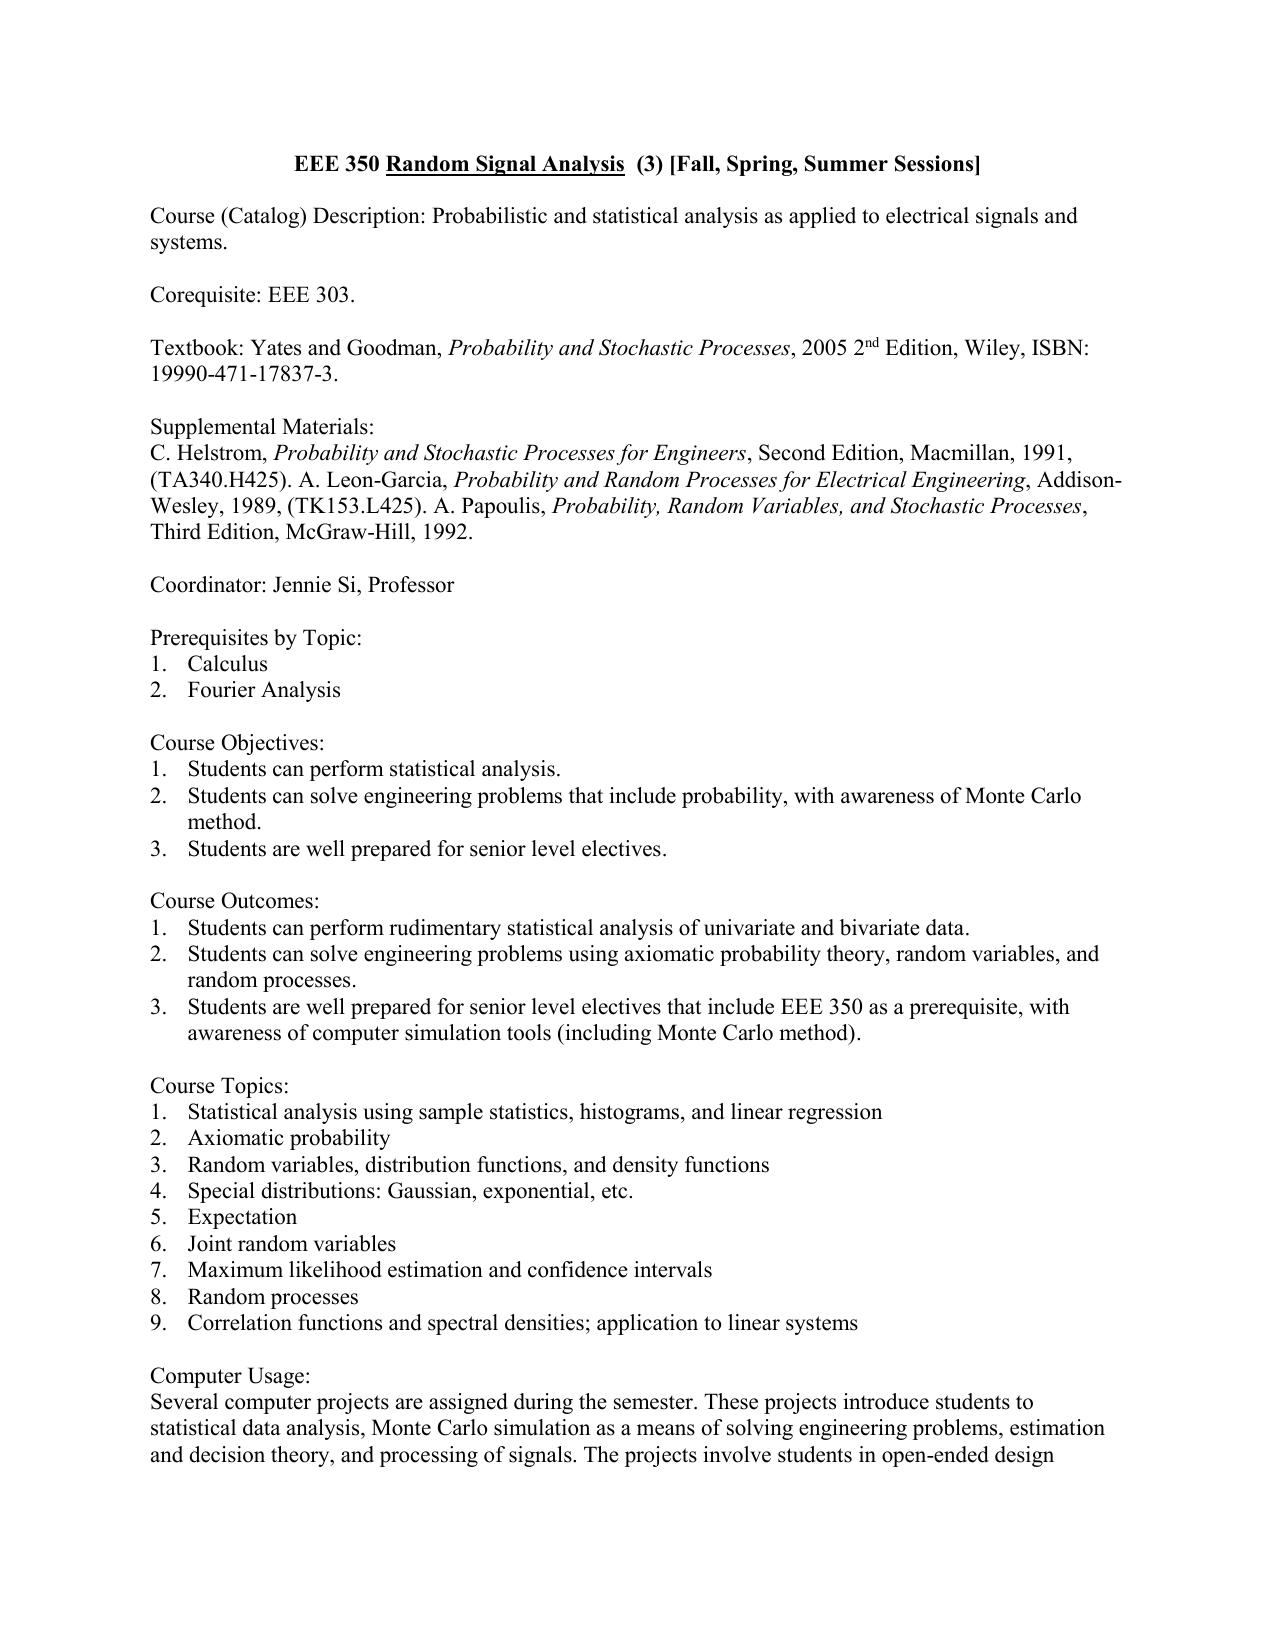 EEE 350 Random Signal Analysis (3) [F, S, SS]